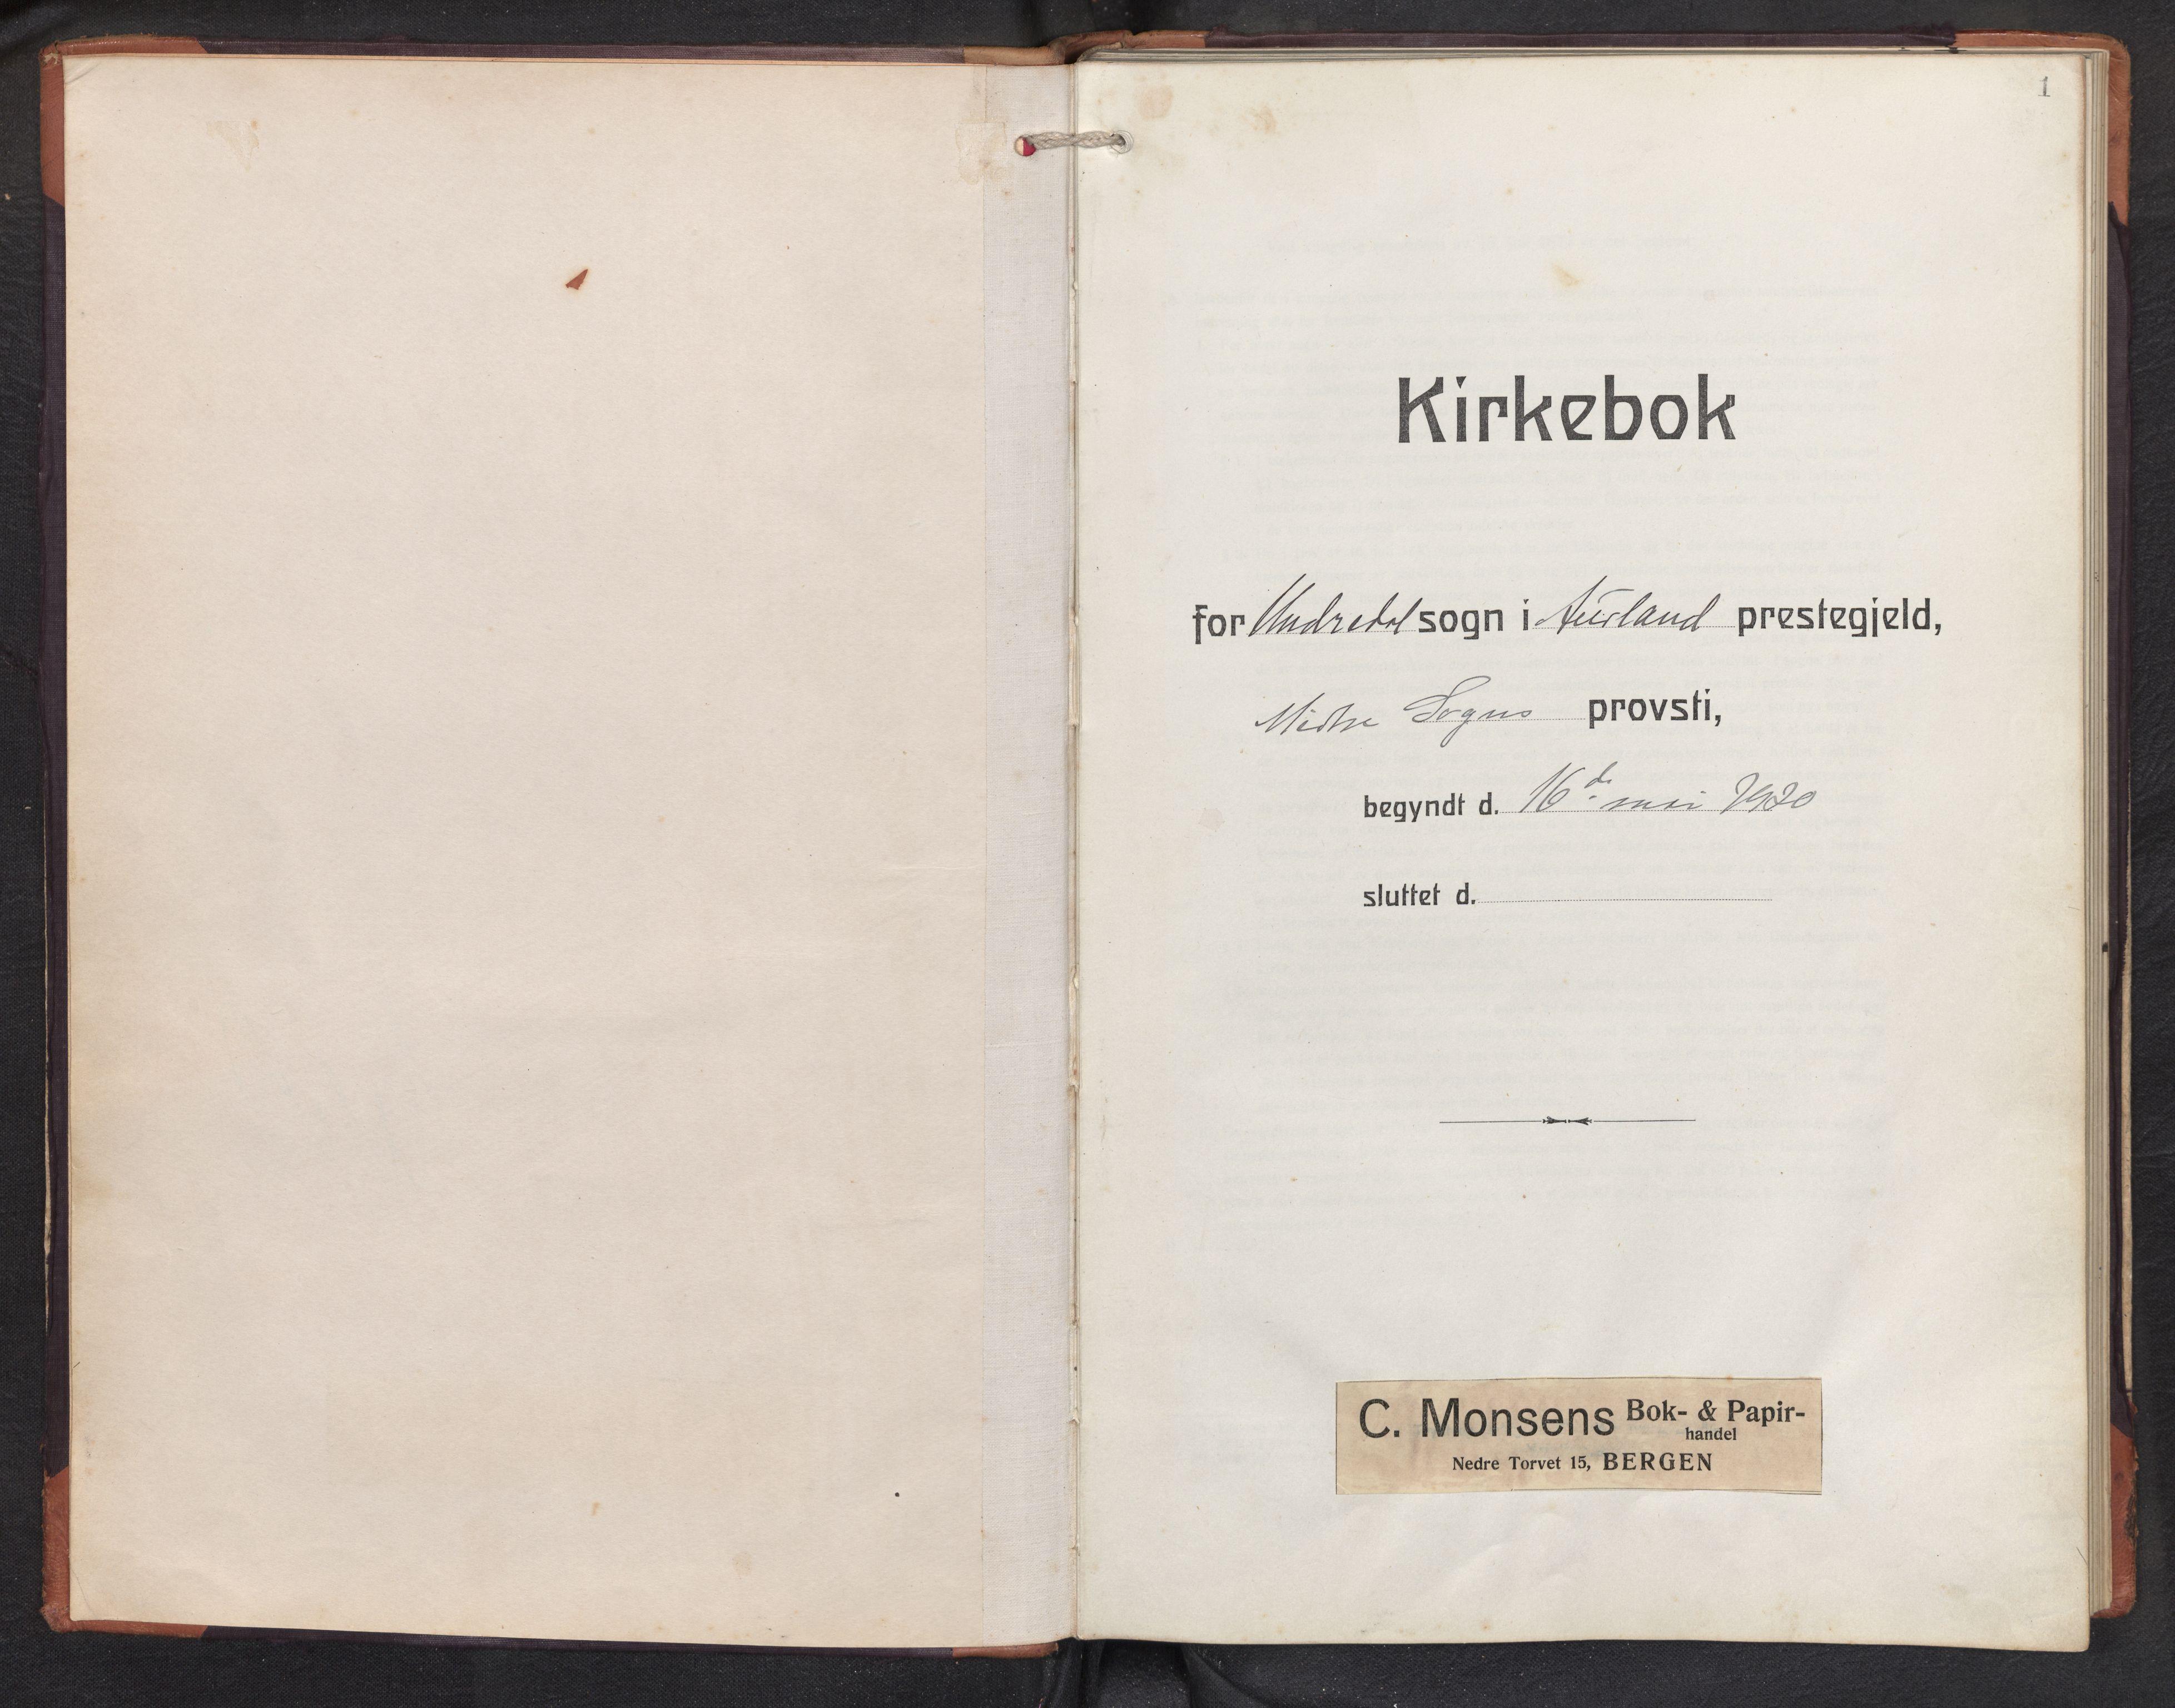 SAB, Aurland sokneprestembete, H/Hb/Hbd/L0003: Klokkerbok nr. D 3, 1920-1968, s. 0b-1a